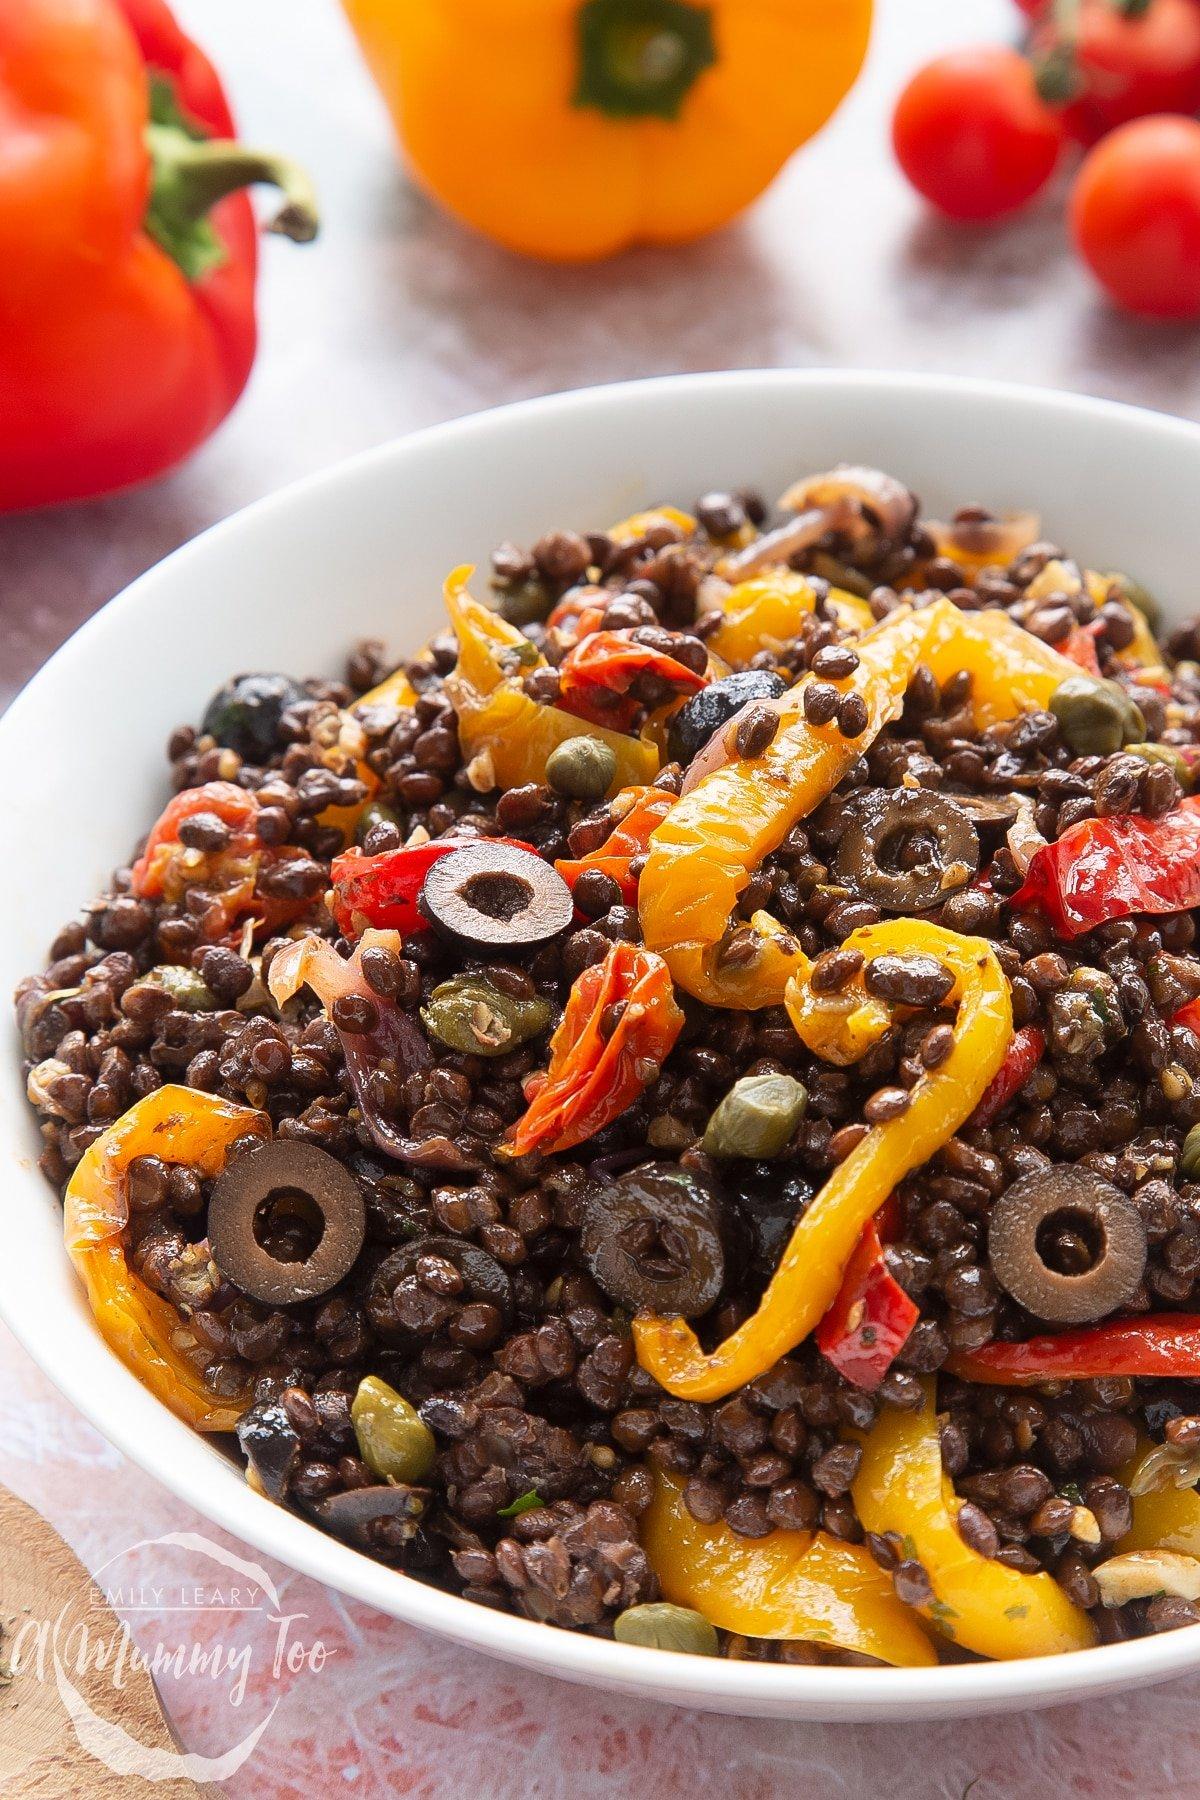 Close up of vegan lentil salad served in a white shallow bowl.